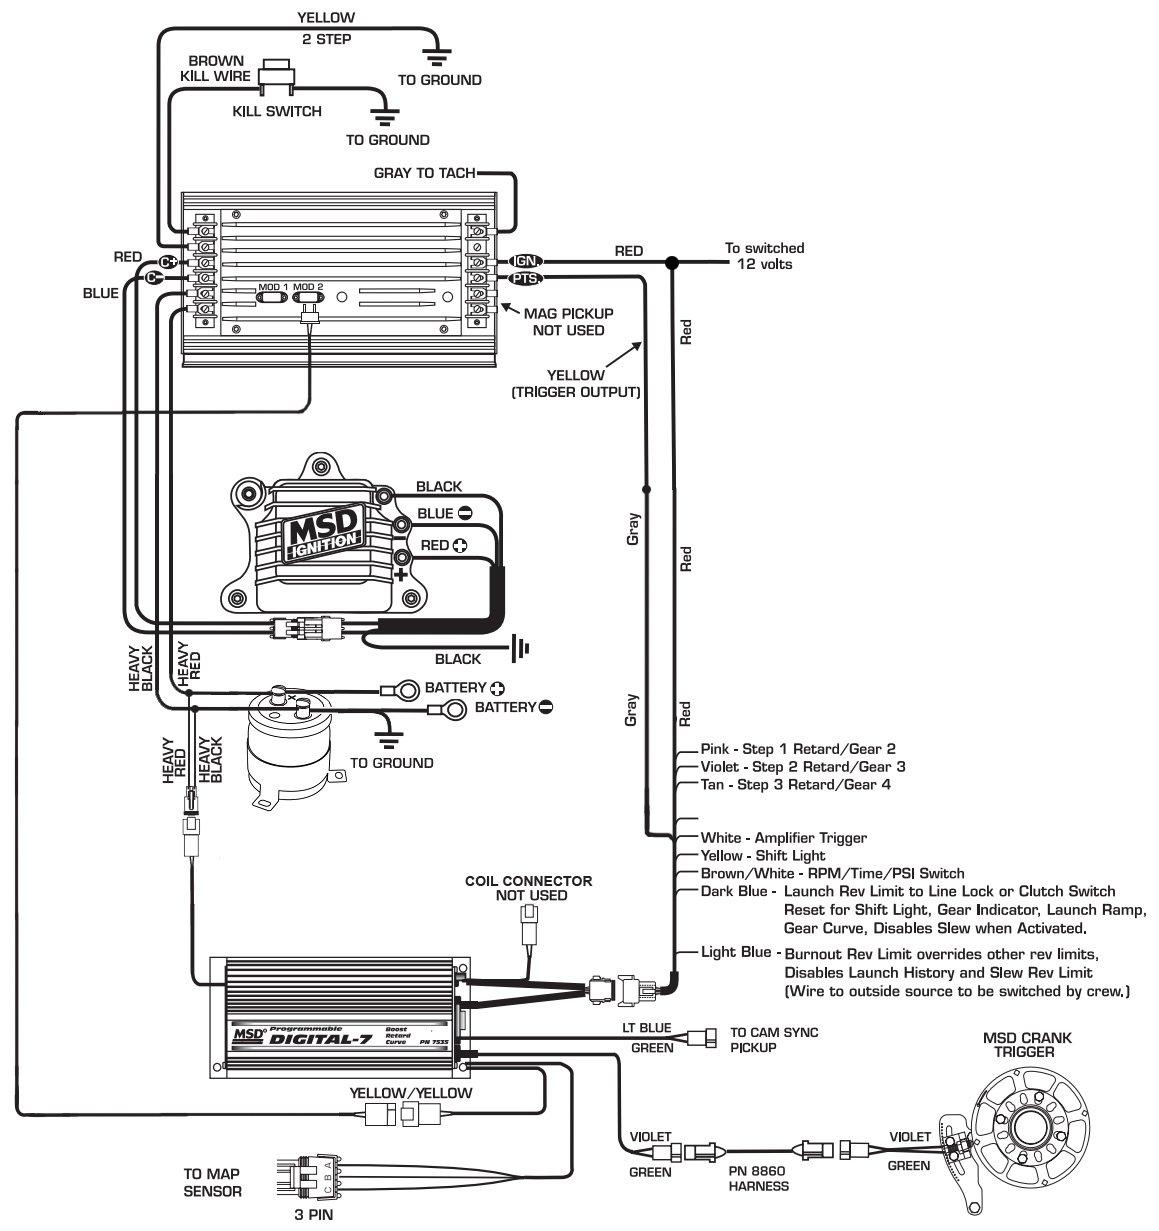 spal fan controller instructions